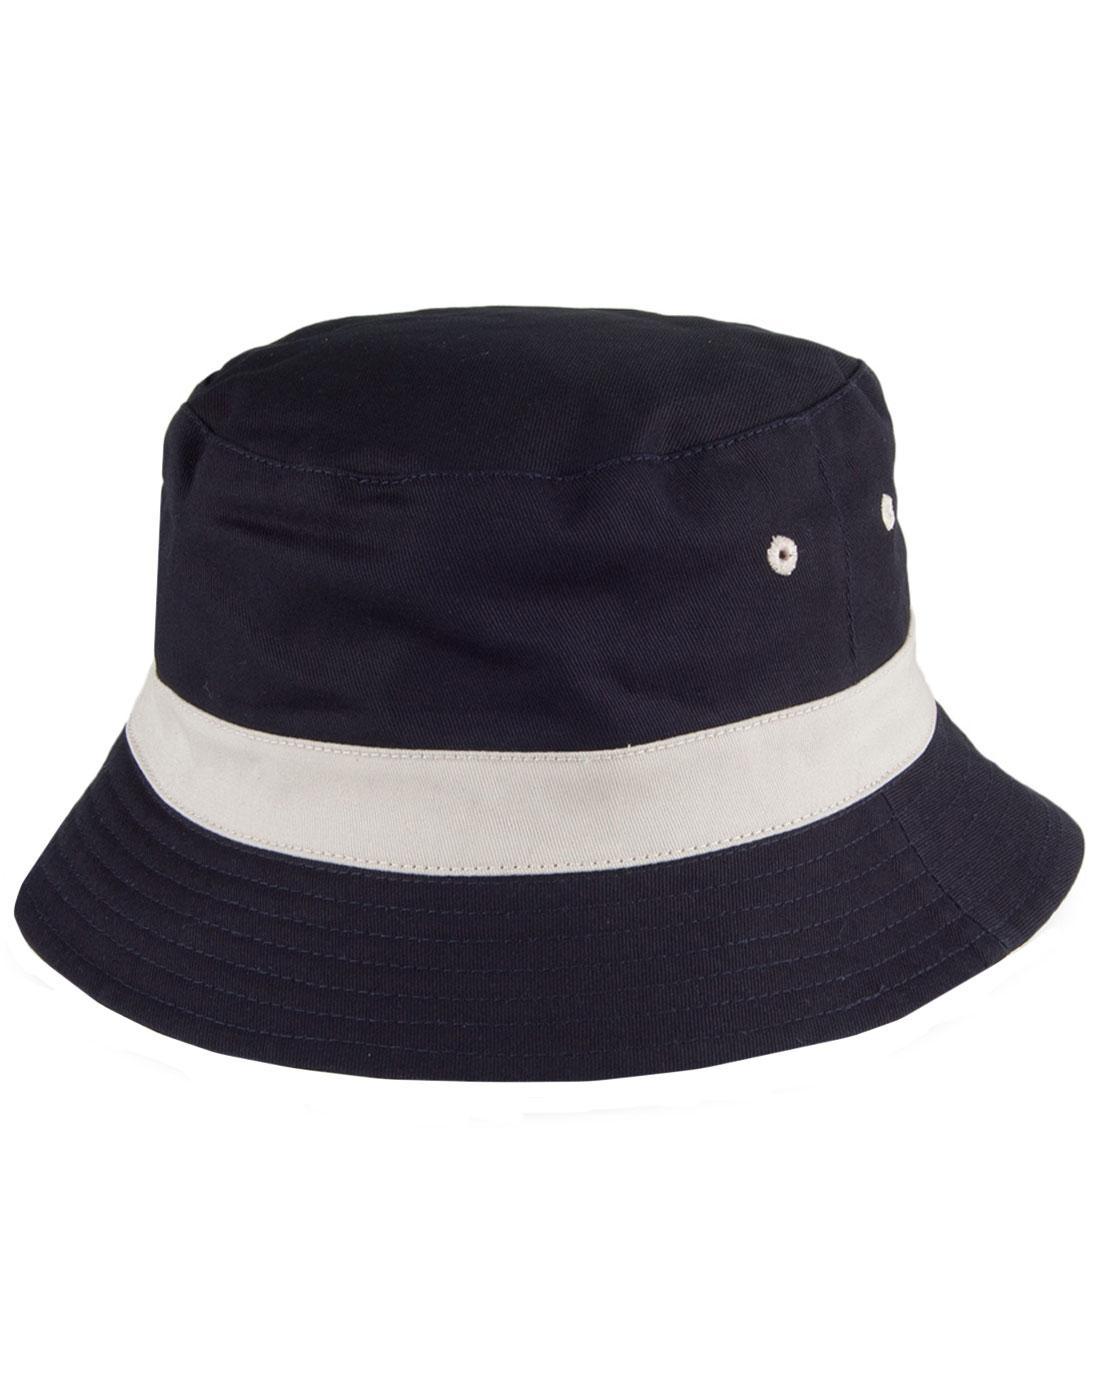 FAILSWORTH Retro 1990s Reversible Bucket Hat